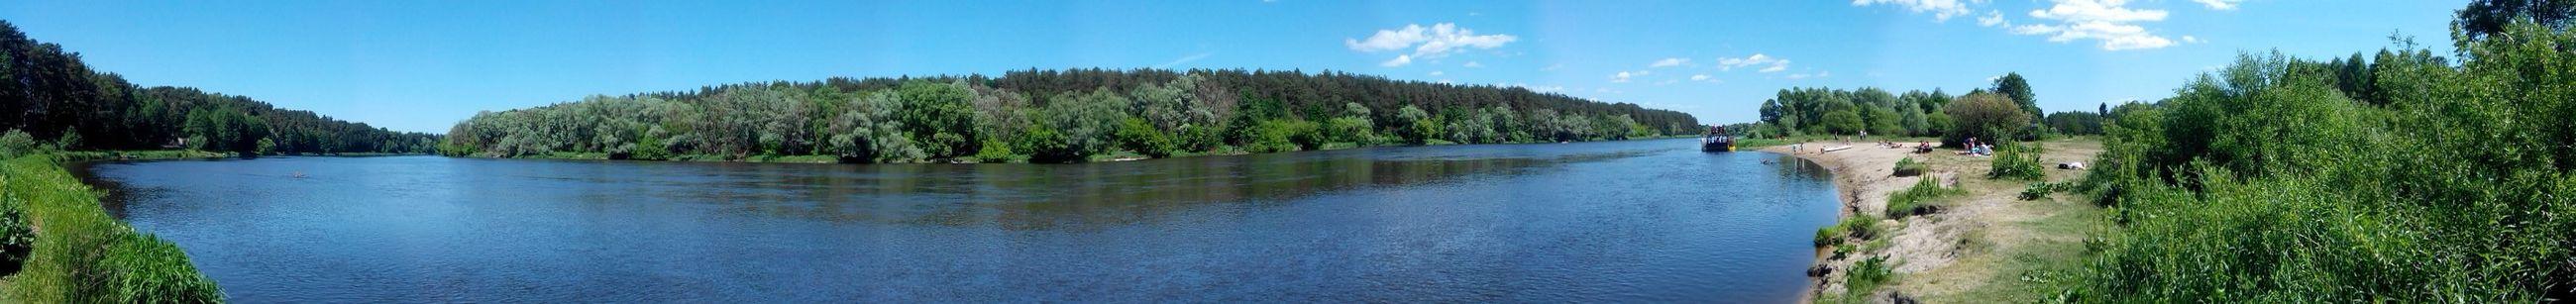 Serpelice Bug River River Beach Landscape Water Landscape